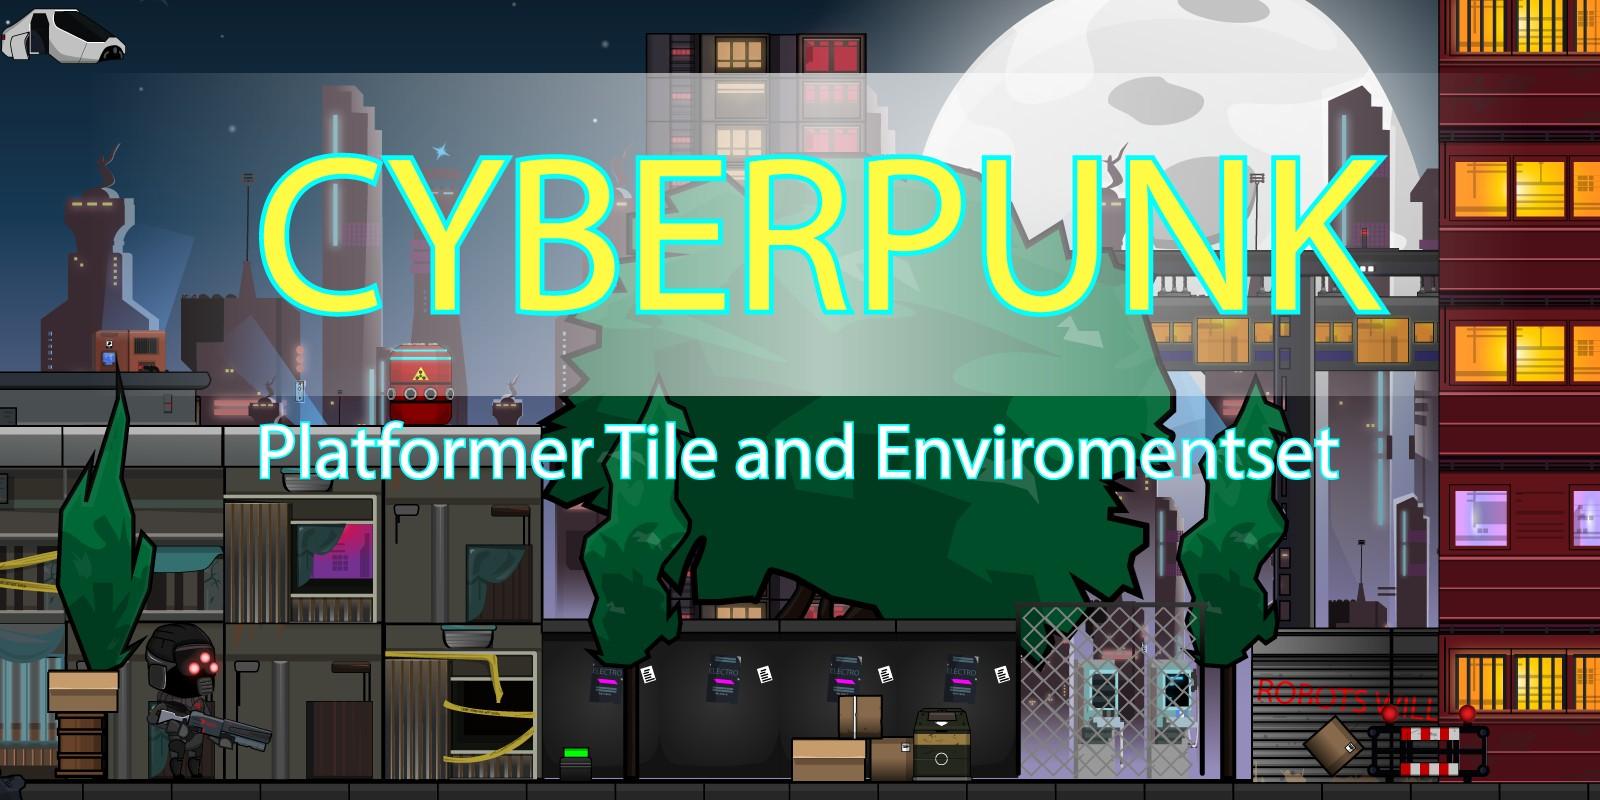 Cyberpunk Platformer Game Tile and Enviromentset